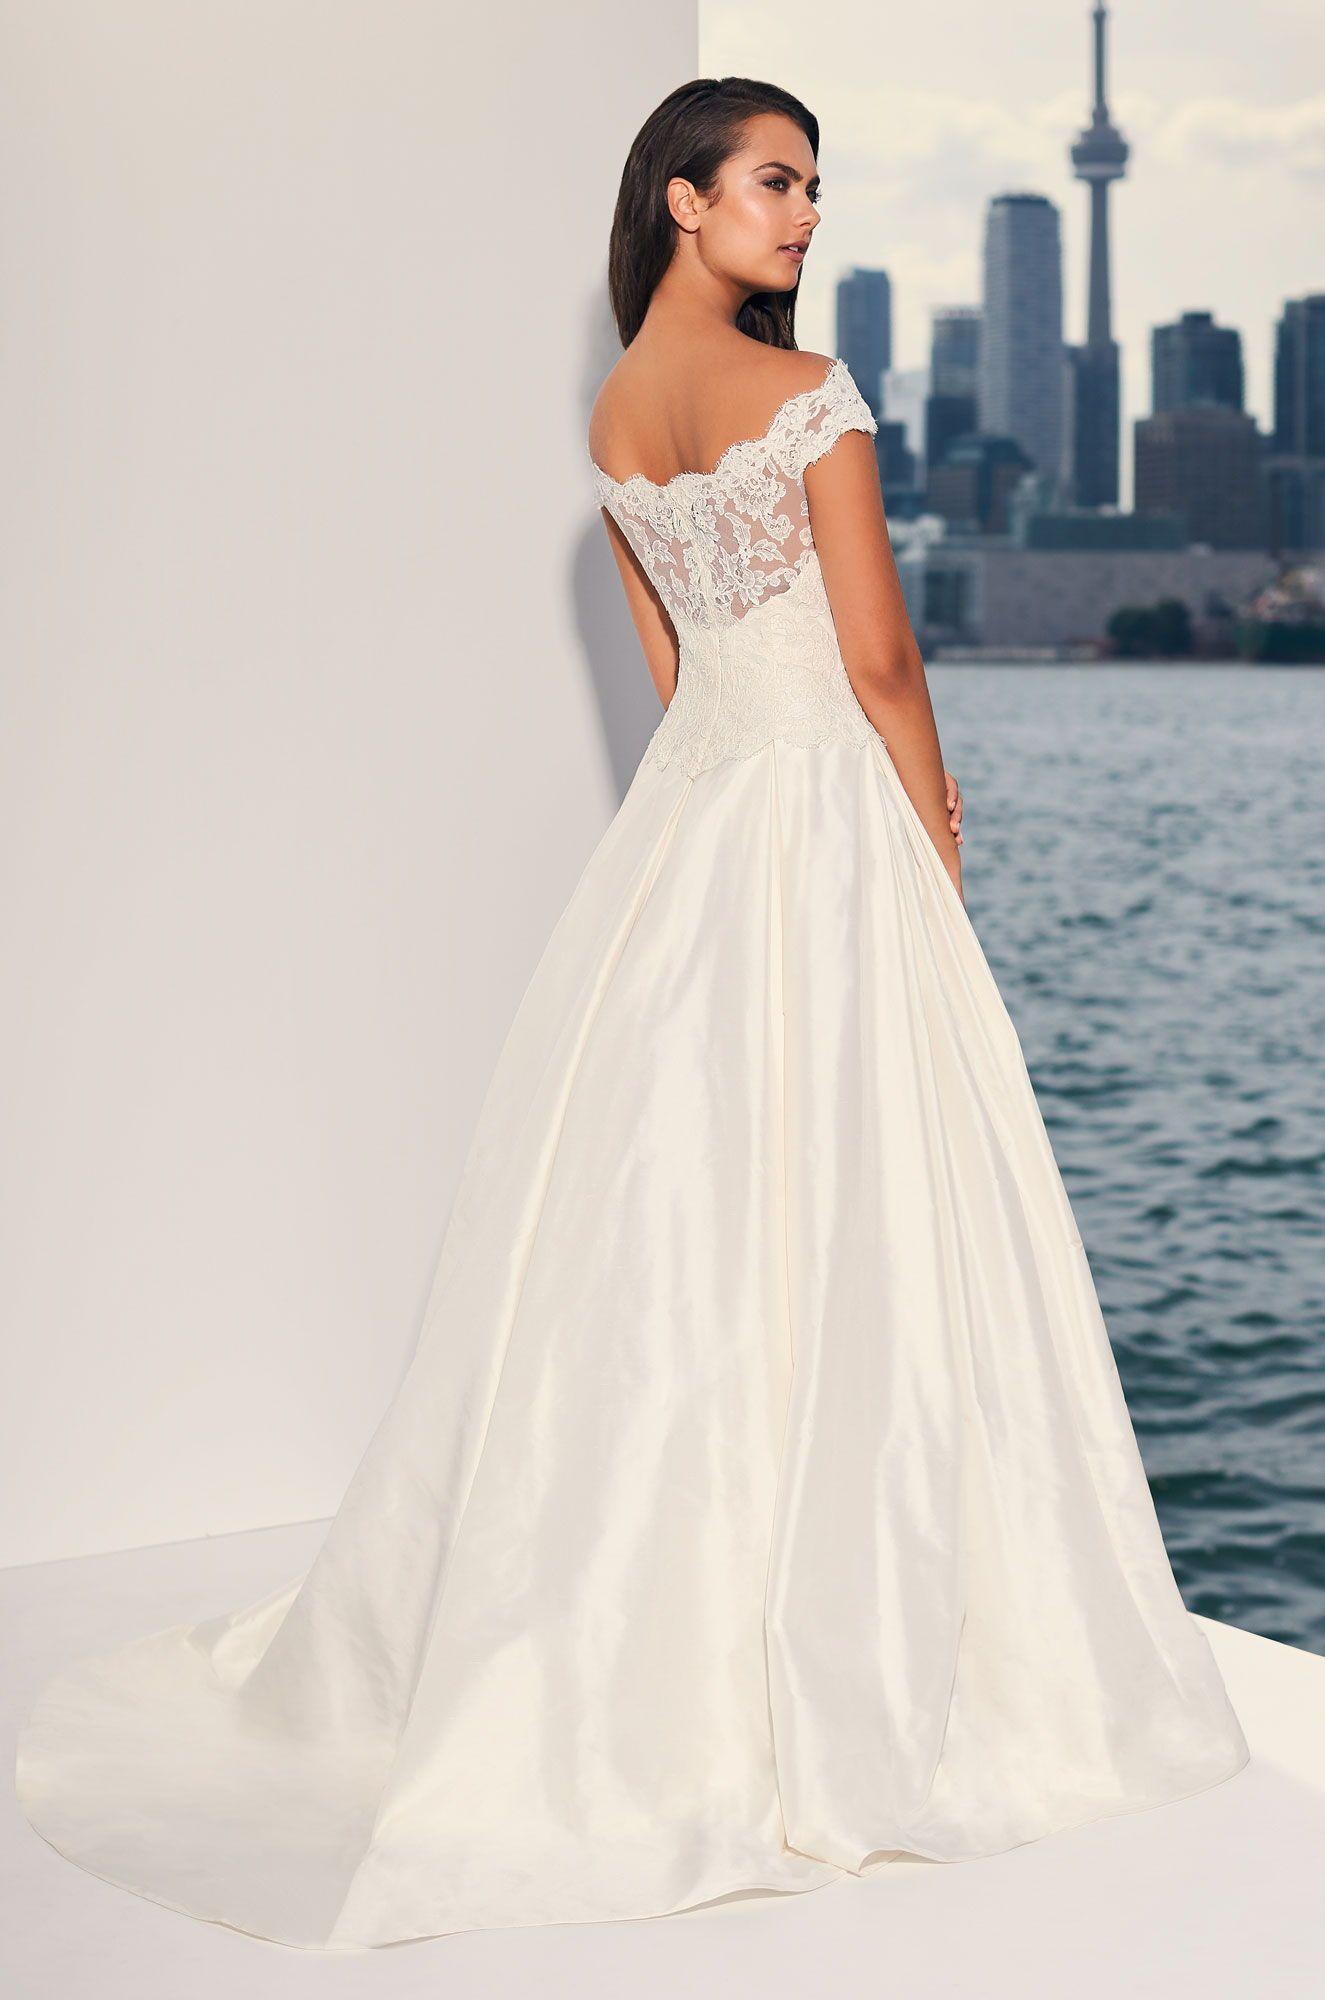 Dropped Waist Silk Wedding Dress Style 4842 In 2020 Wedding